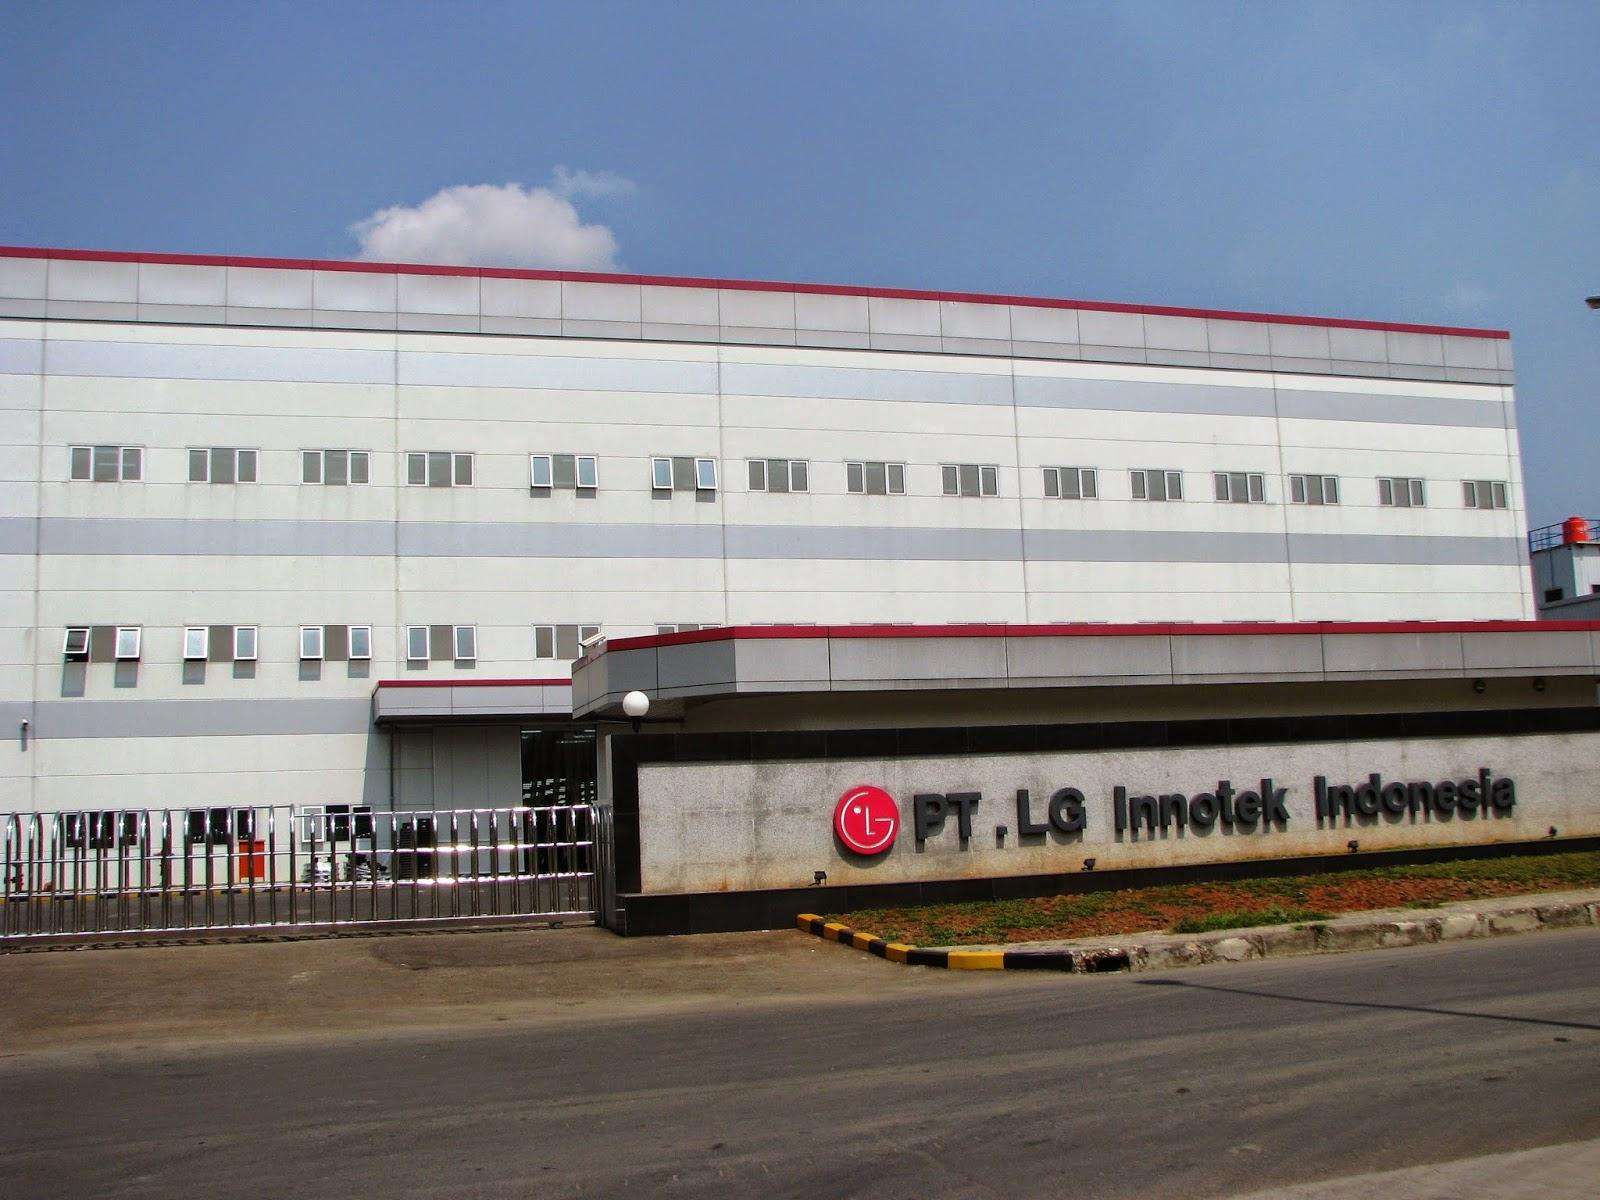 Loker Terbaru Via Pos Cikarang-PT LG Innotek Indonesia 2017